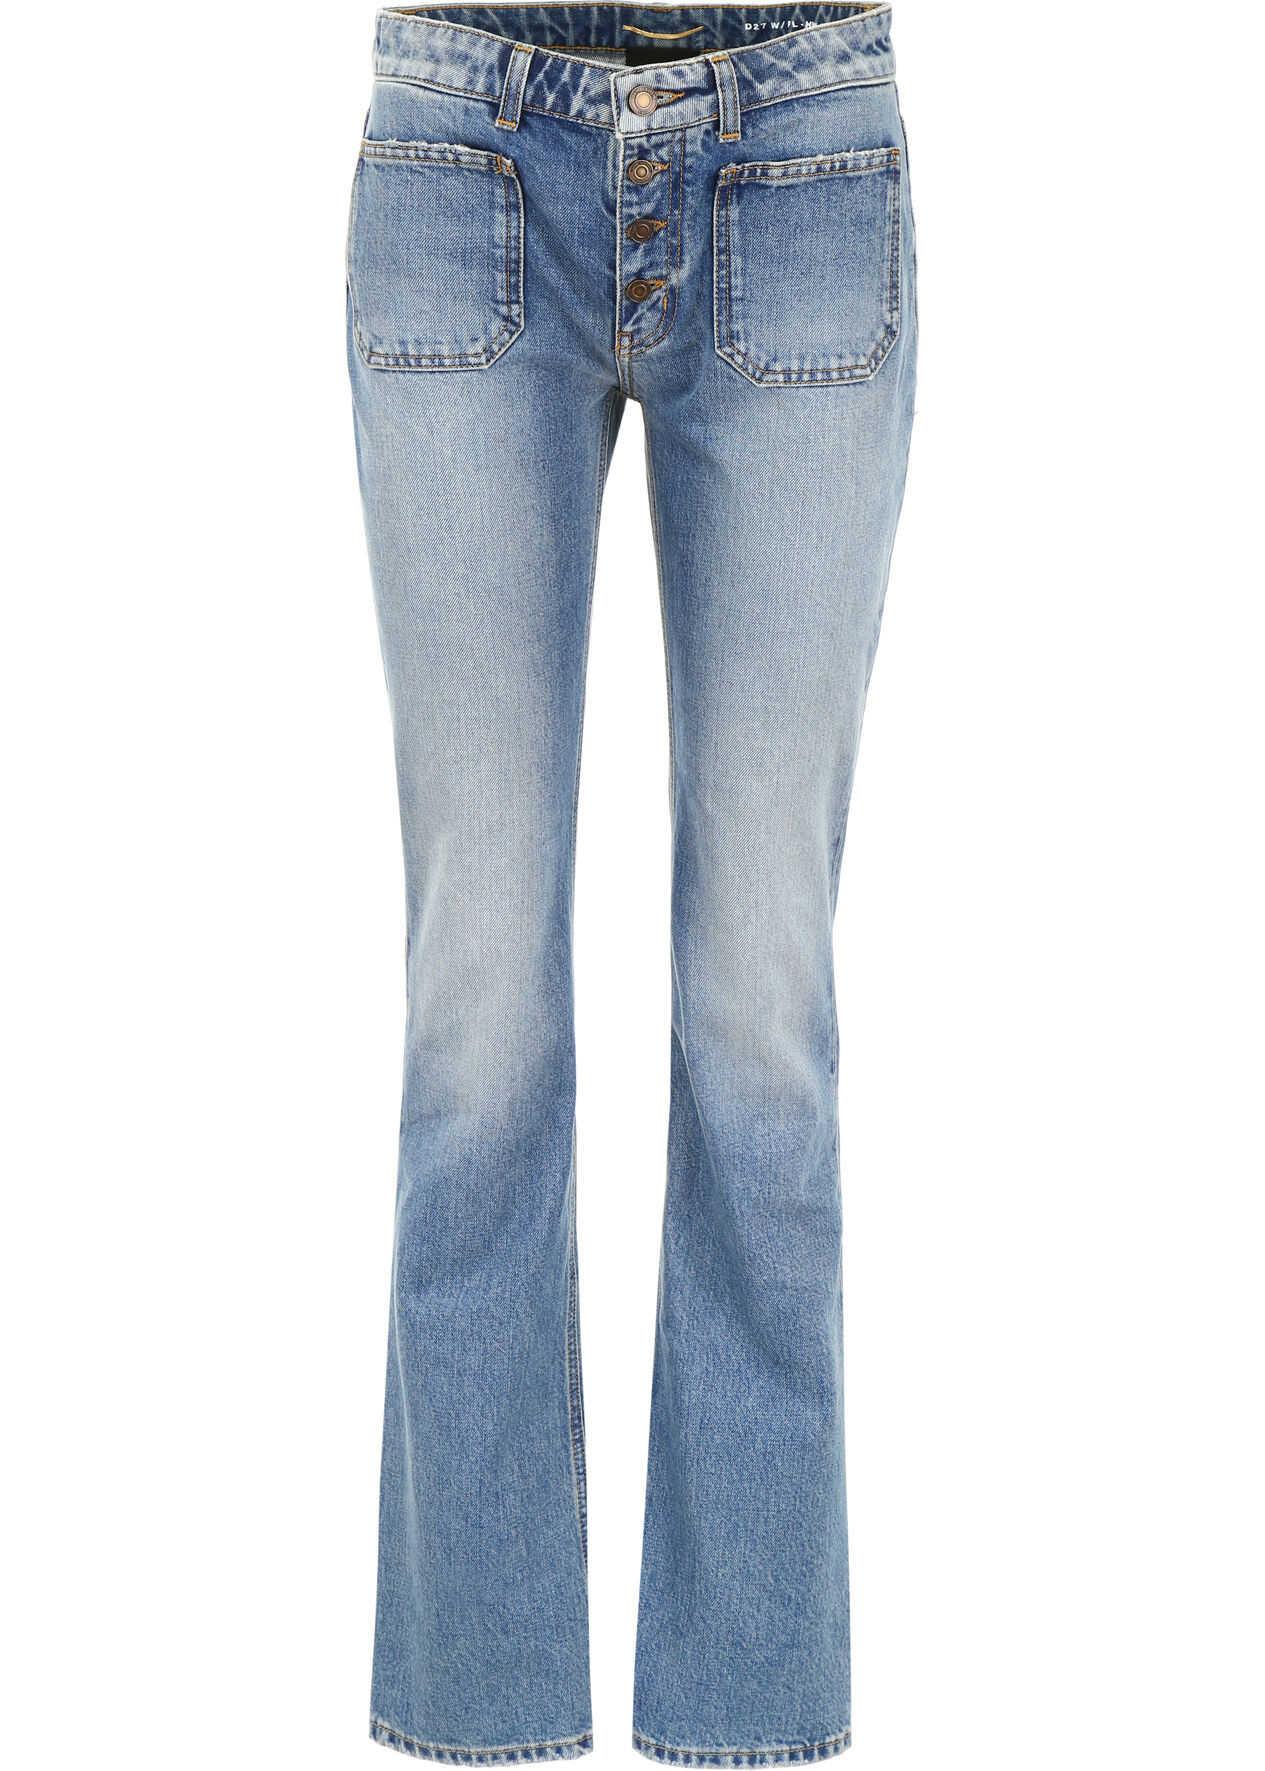 Saint Laurent Flare Jeans USED 70 S BLUE